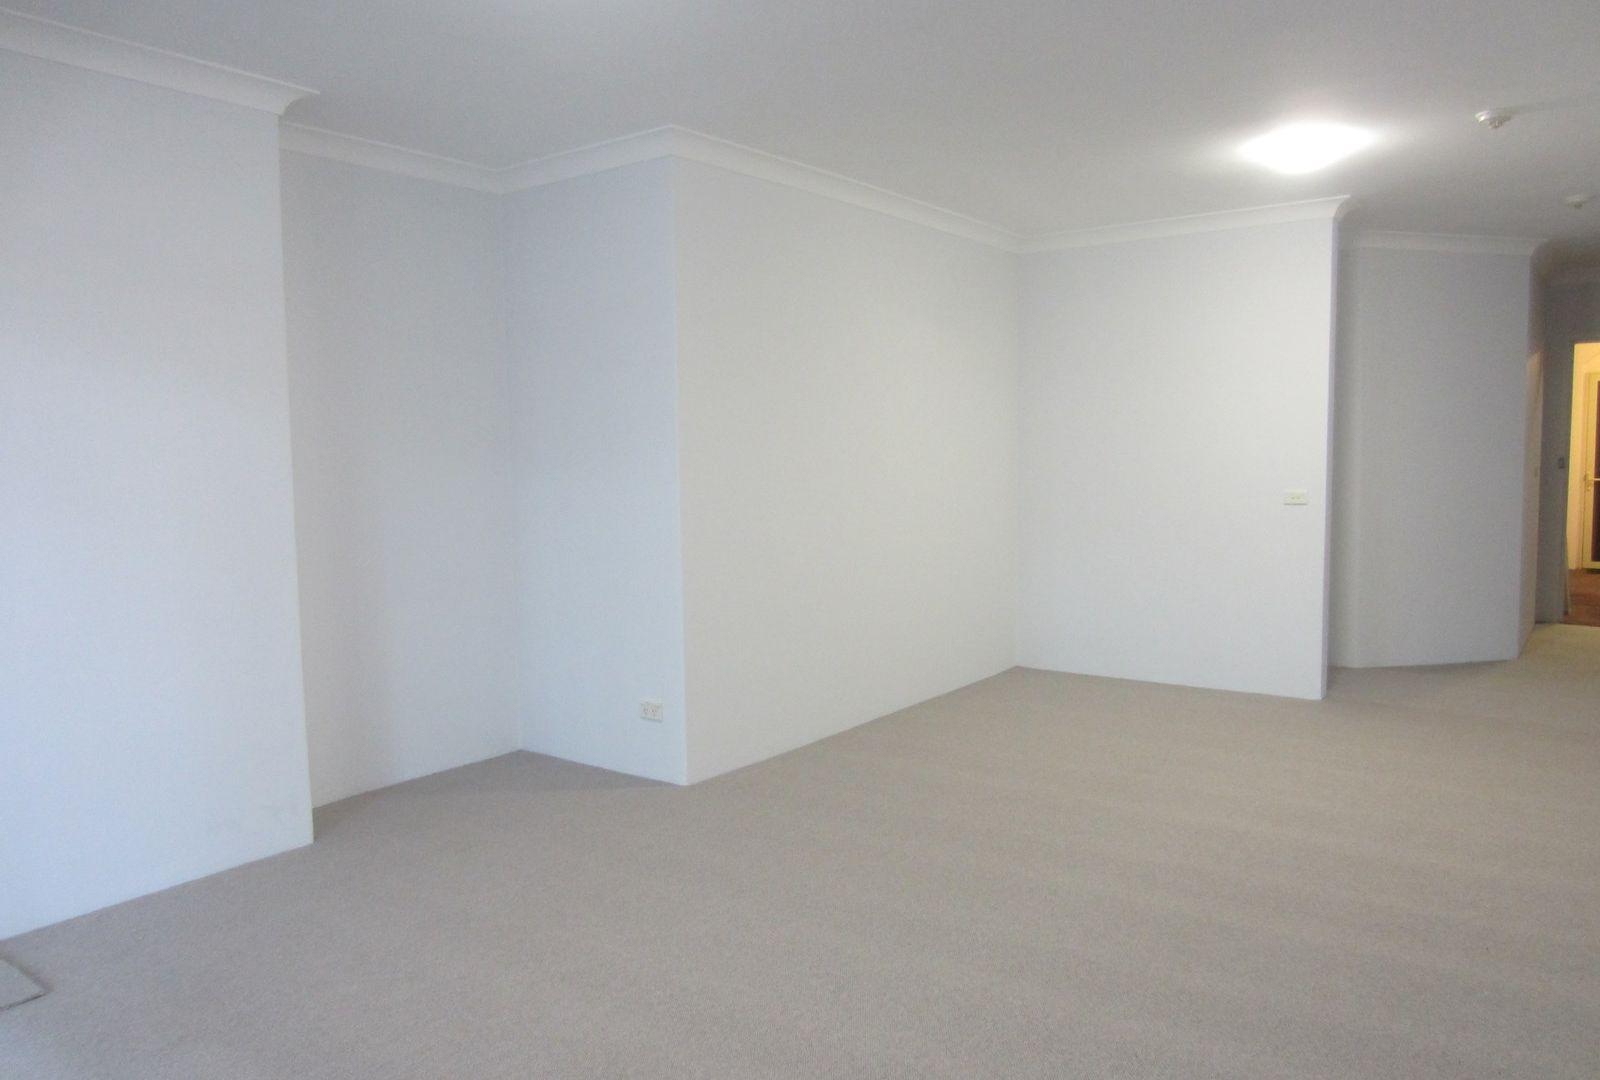 23/96 Albert Avenue, Chatswood NSW 2067, Image 2